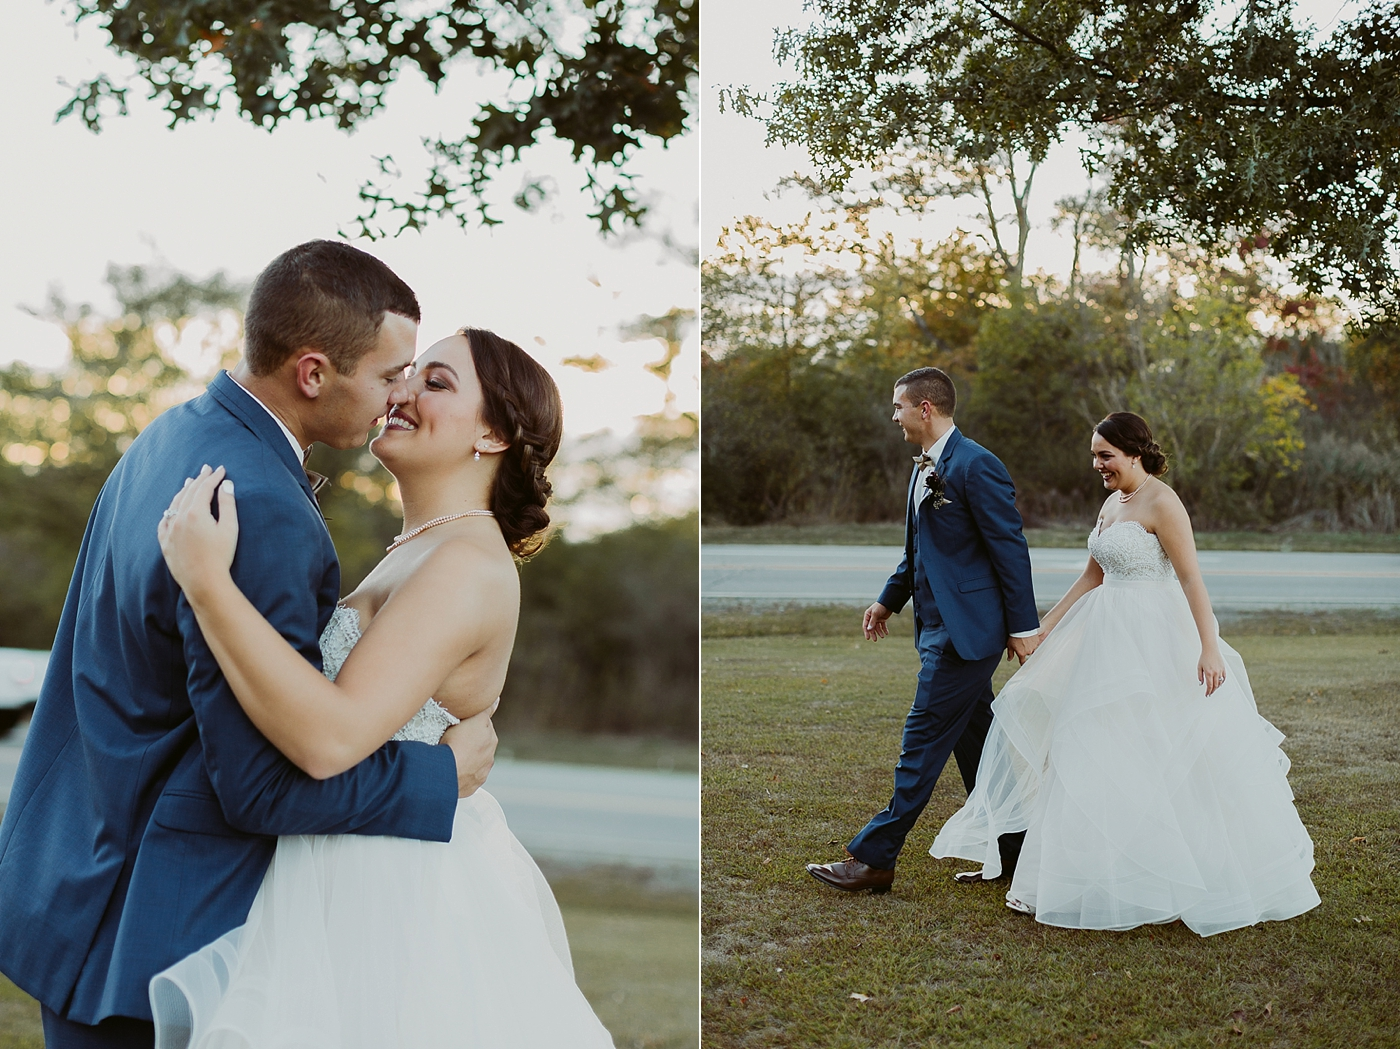 TheHeartlanders-Massilon-Ohio-Wedding-Photography-13.jpg